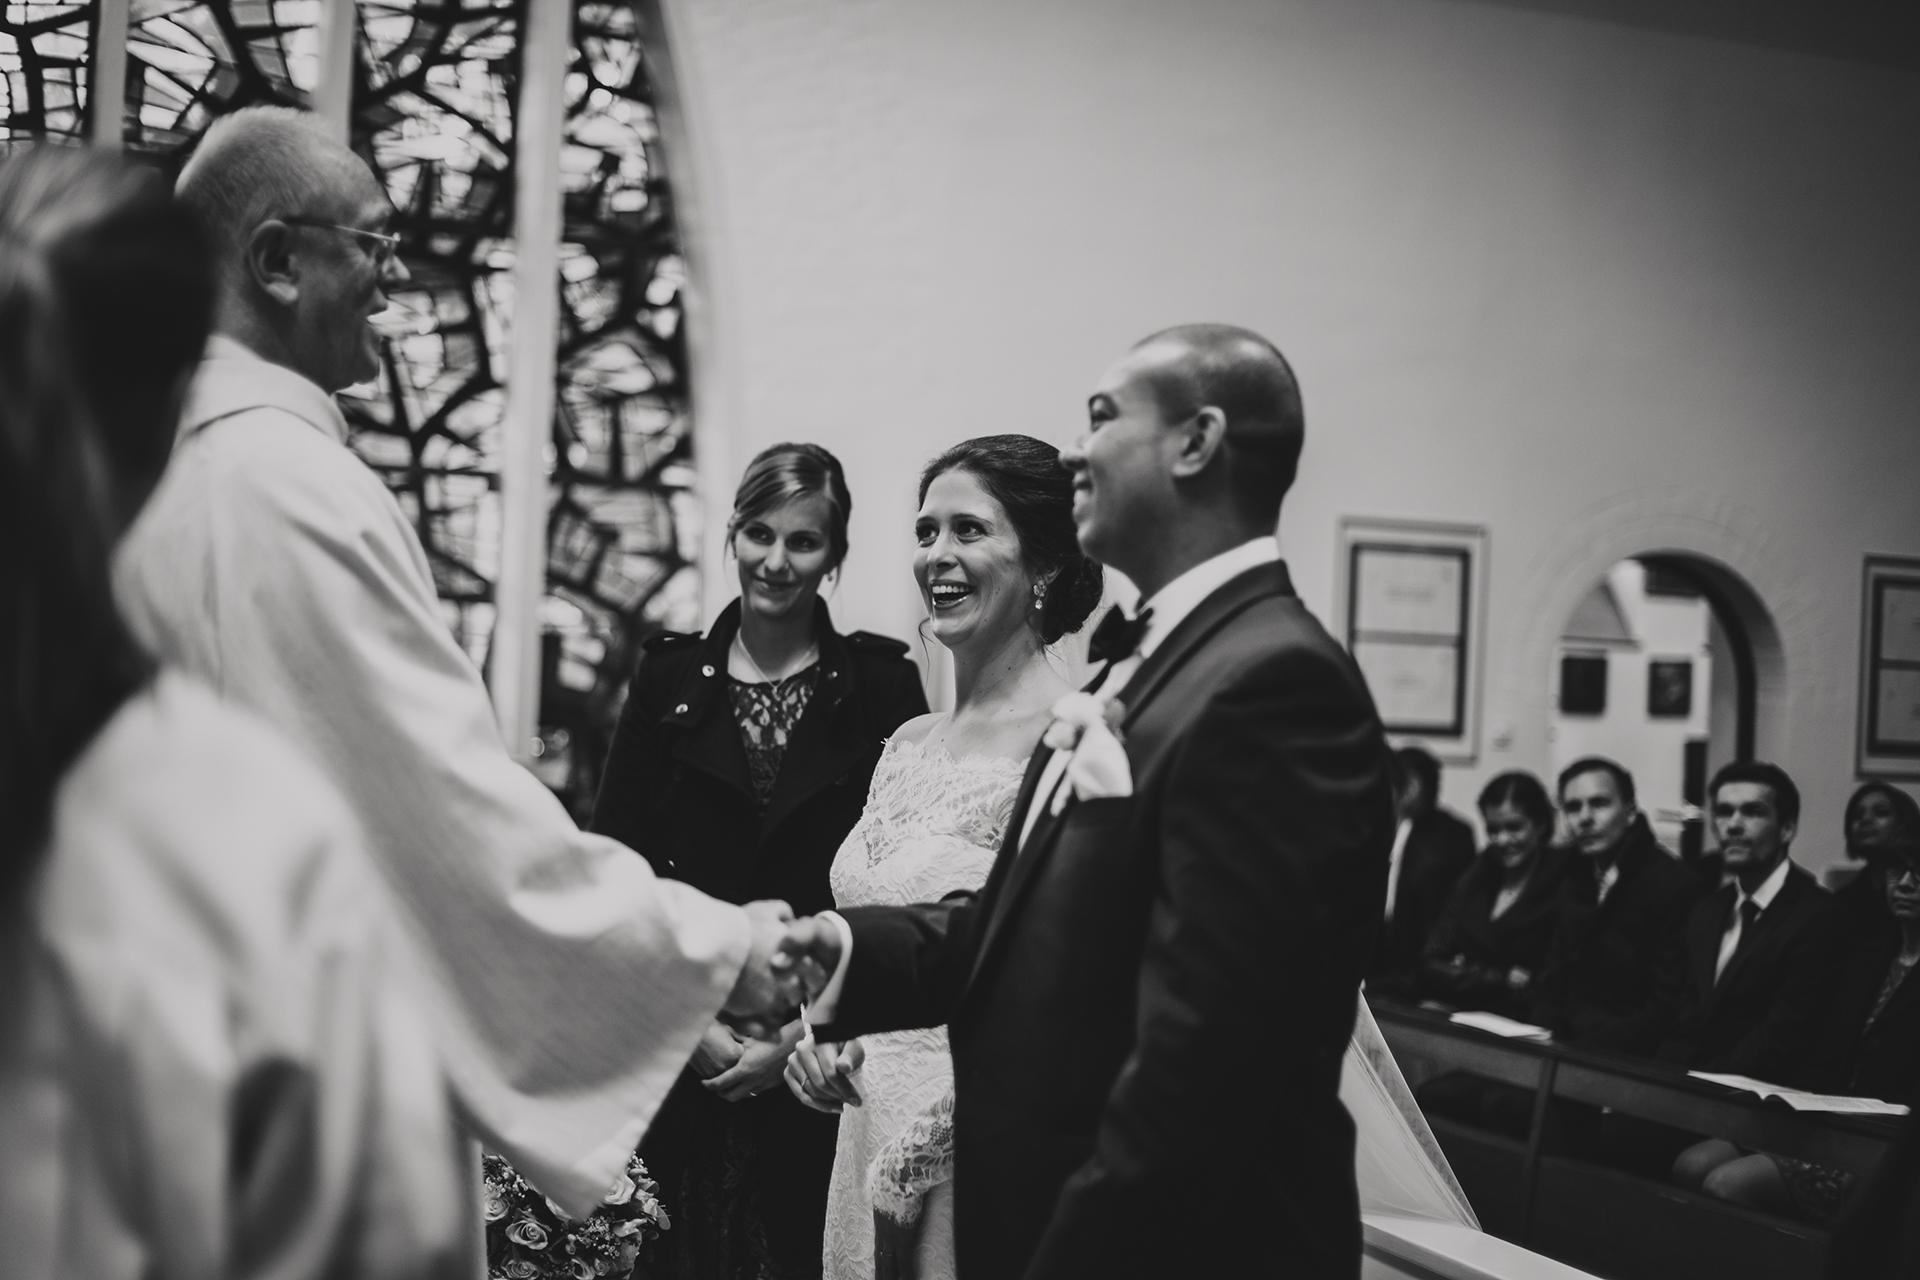 Hochzeitsreportage_J&D_027_Caroline Queda Fotografie